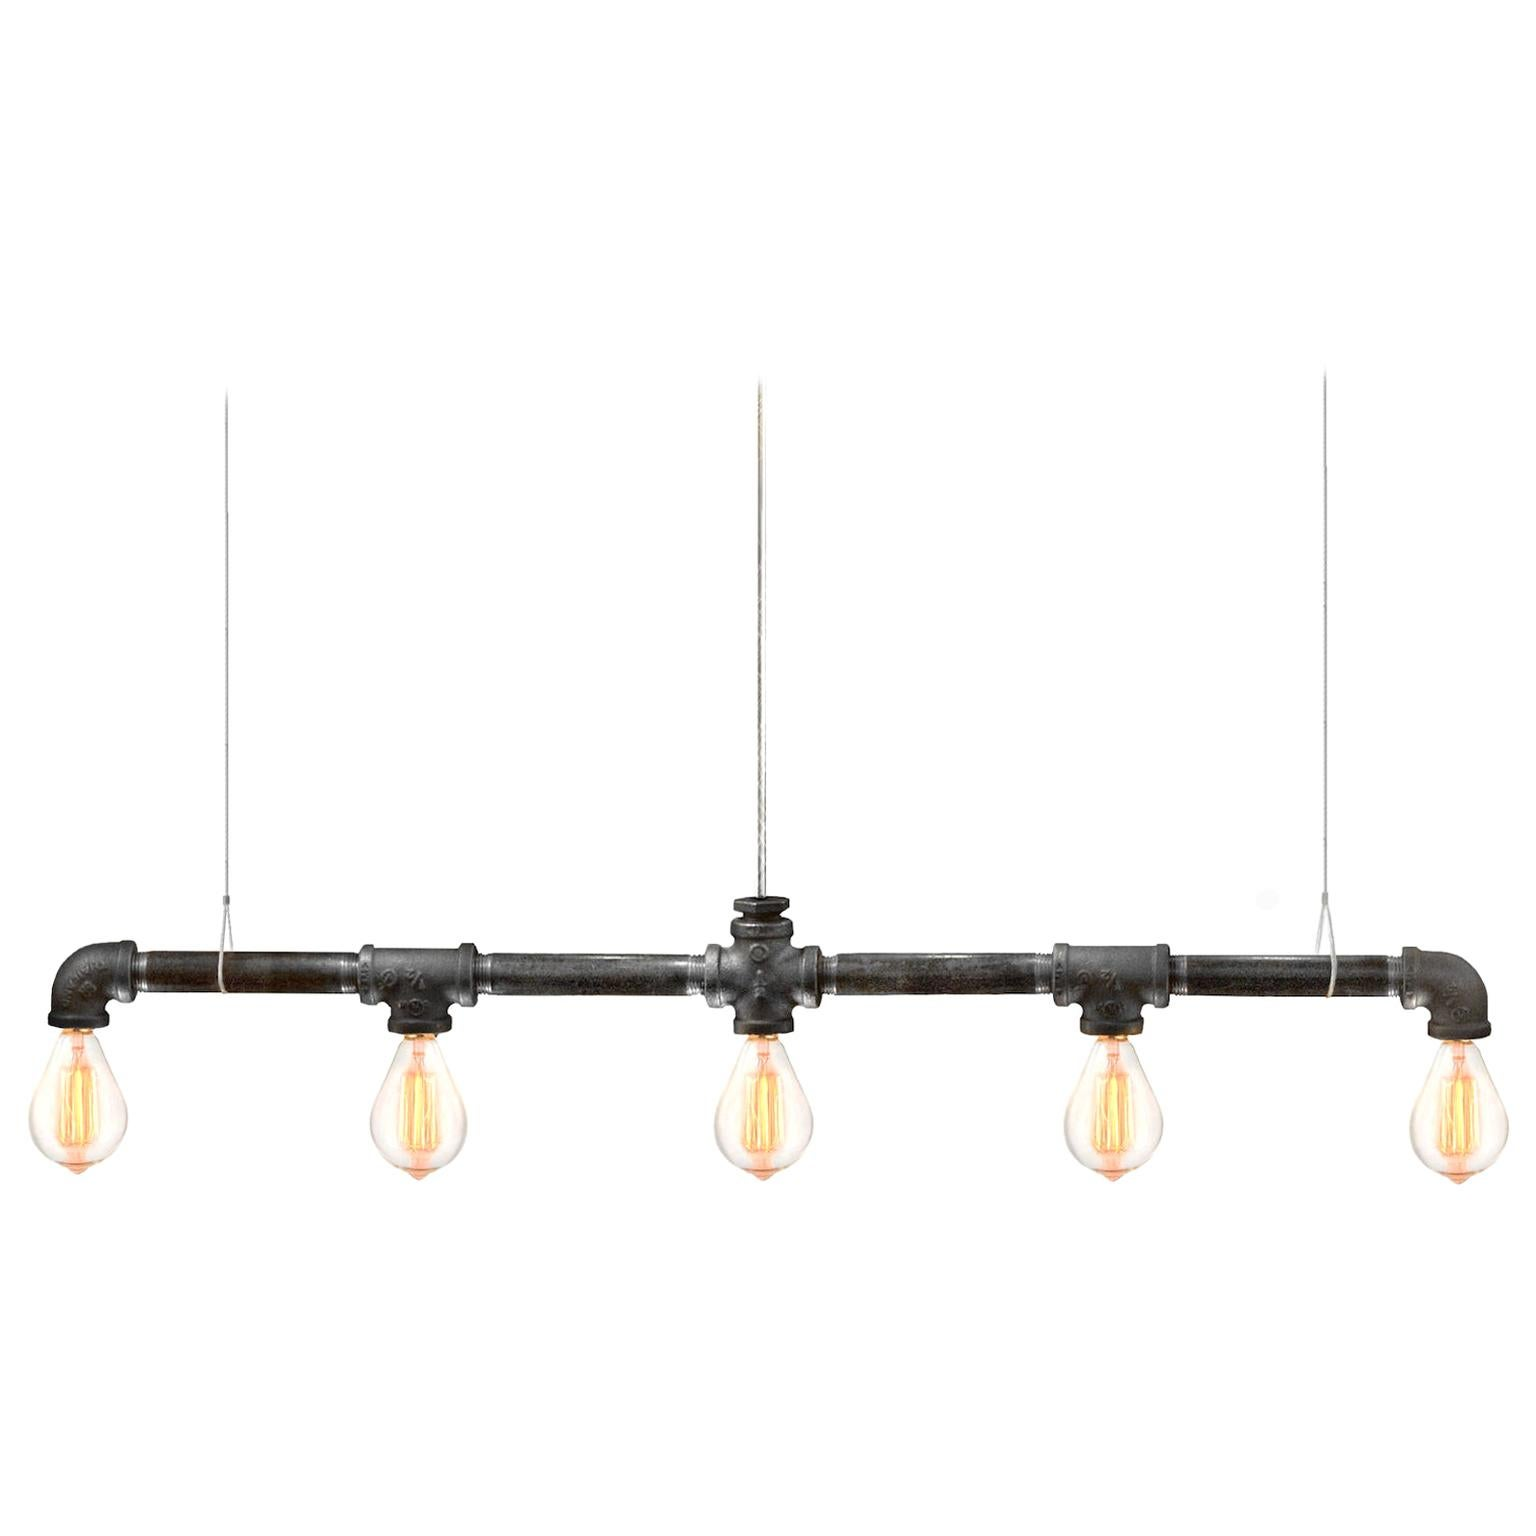 Raw Steel Bar 5-Light Linear Suspension